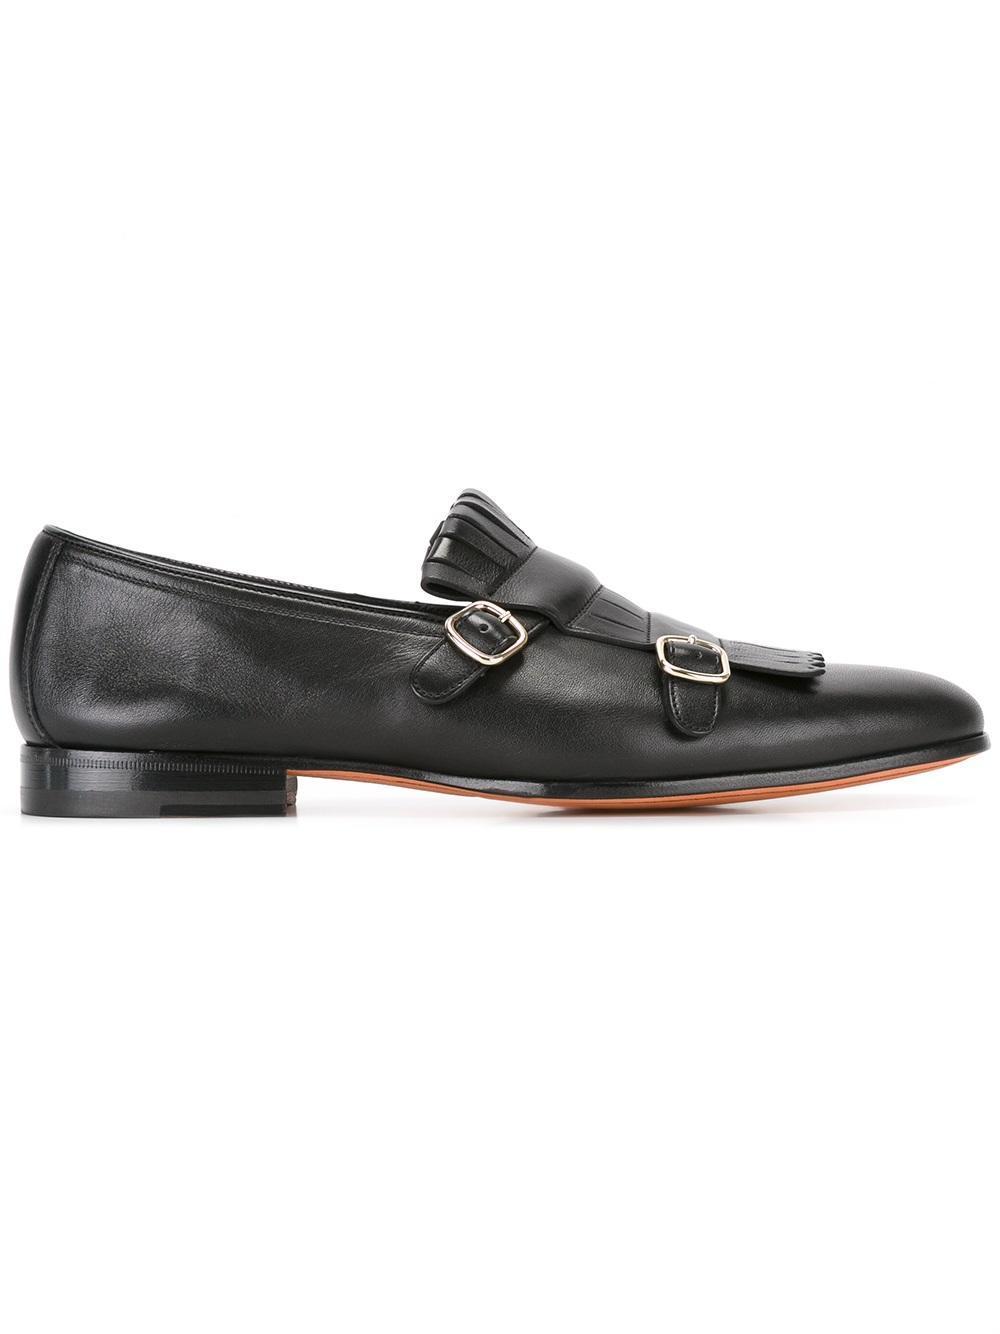 Santoni Fringed Monk Shoes in Black for Men